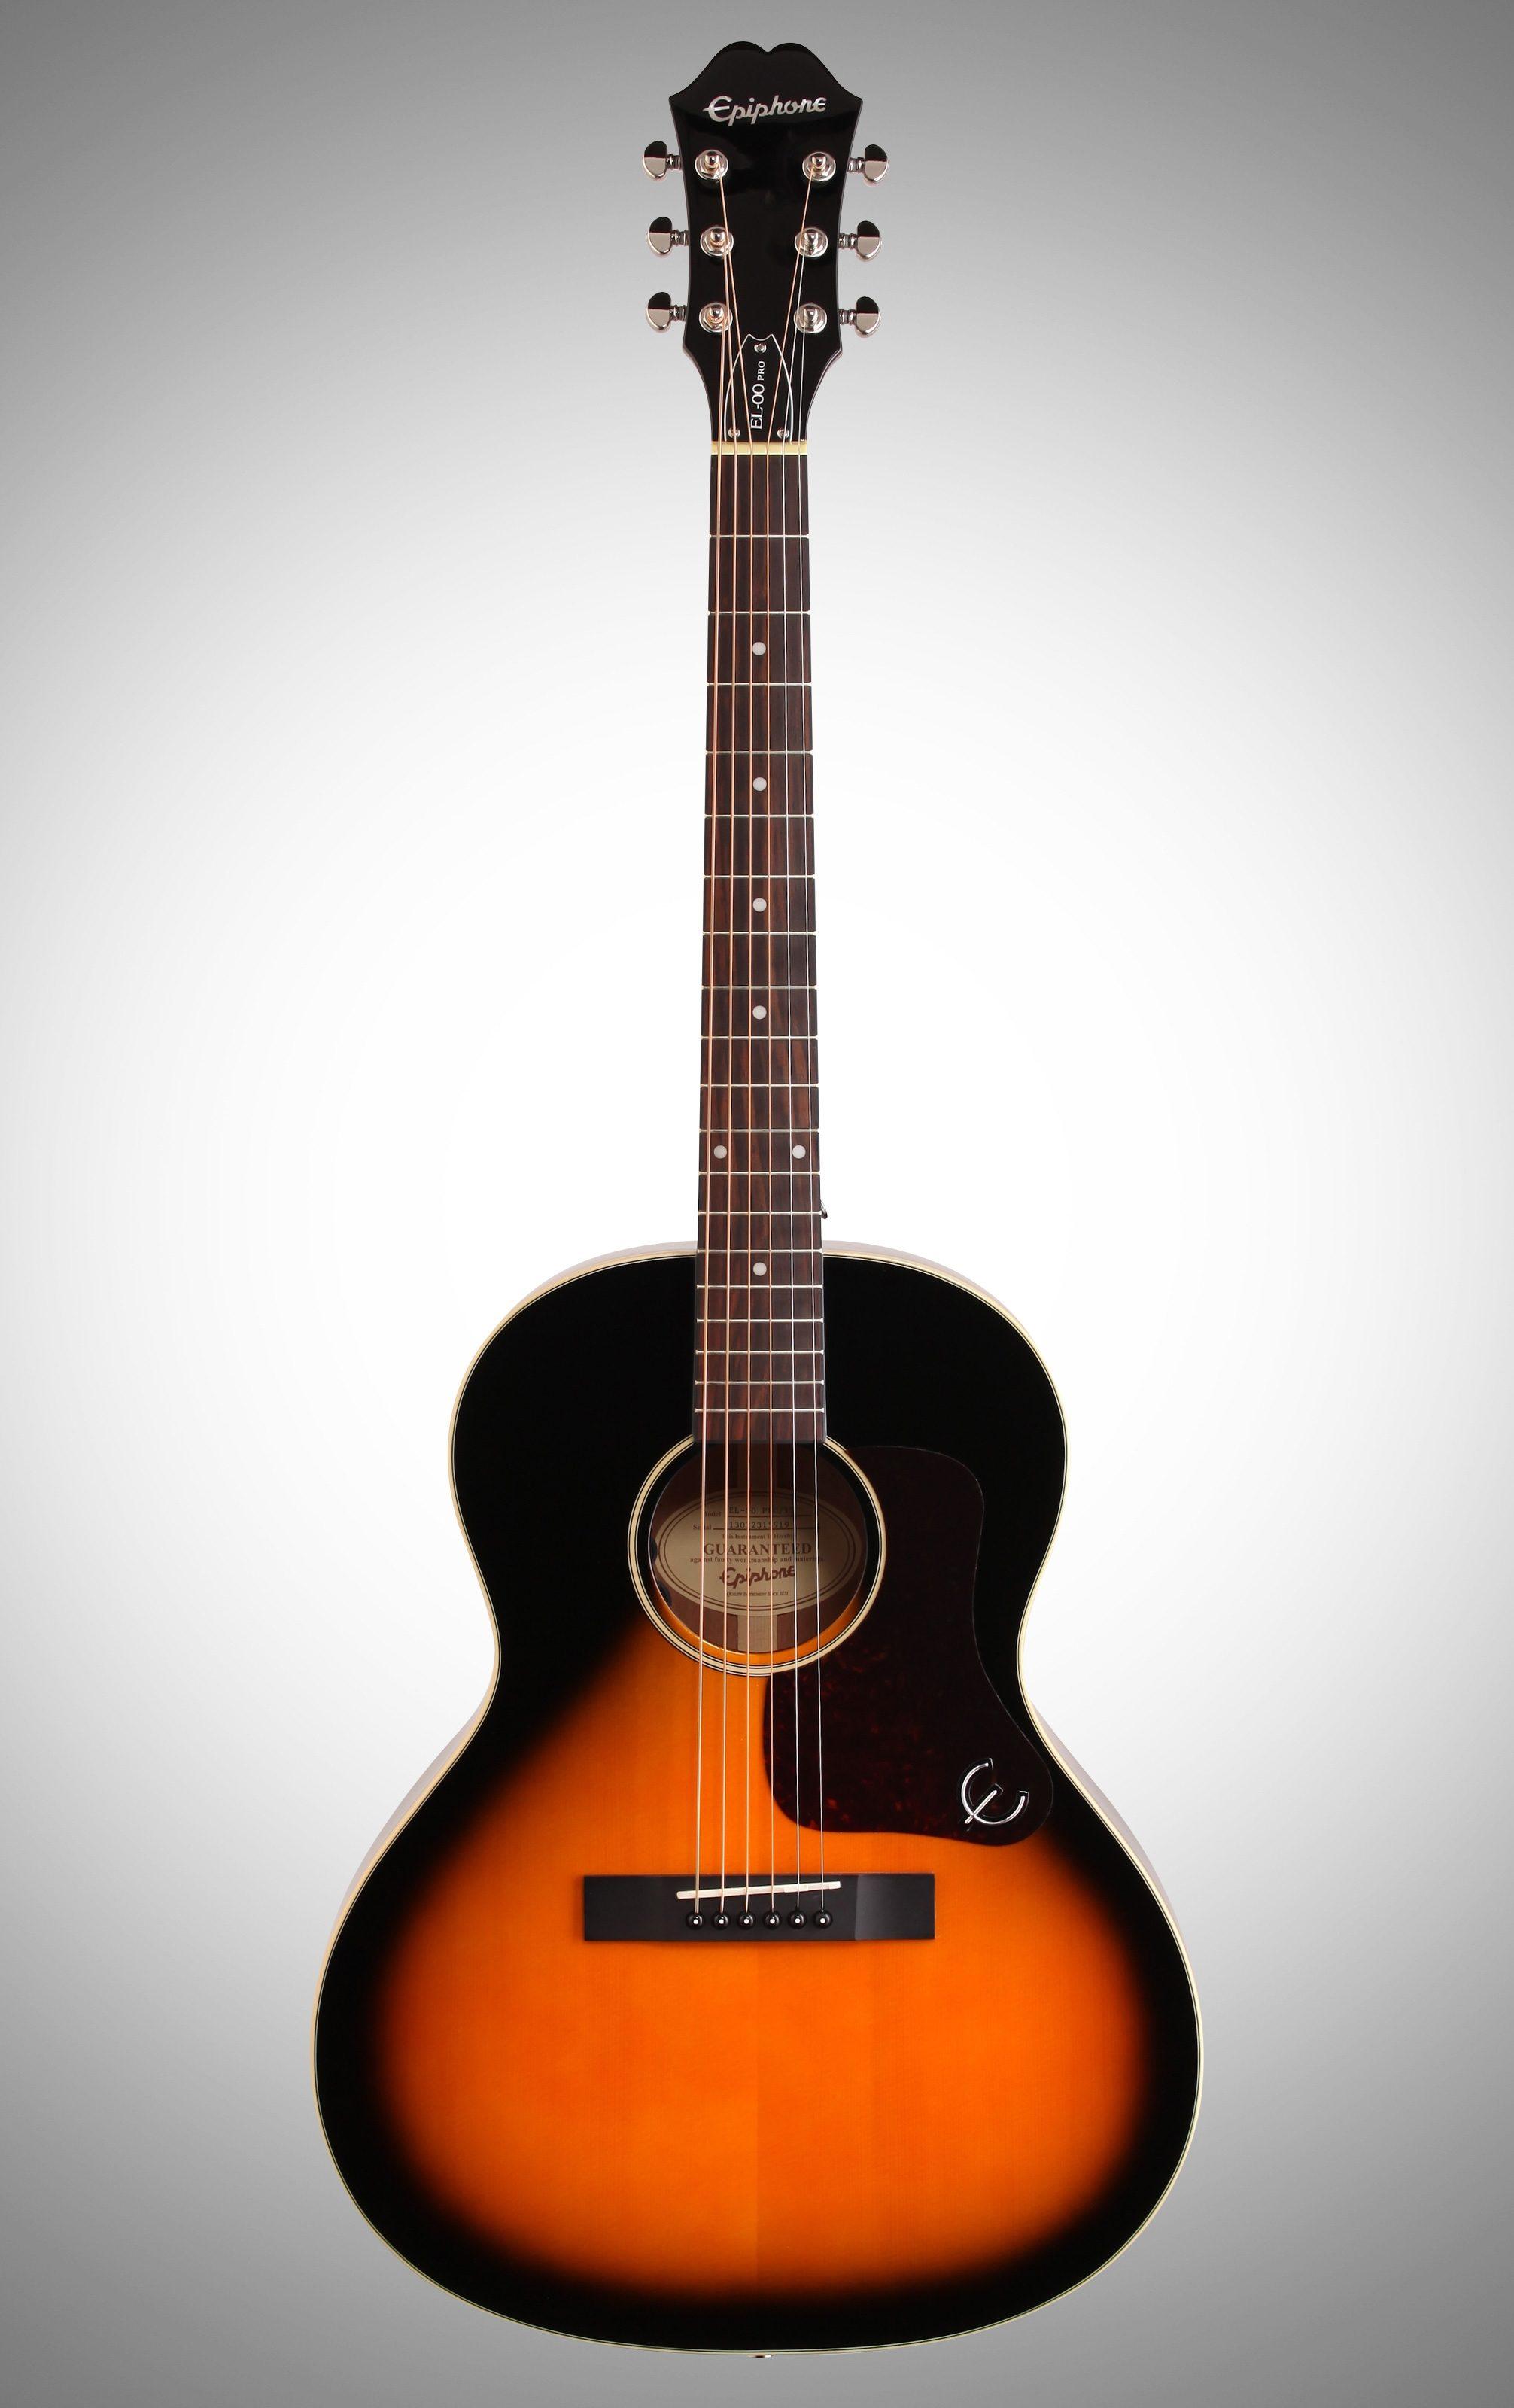 Epiphone Acoustic Electric Guitars